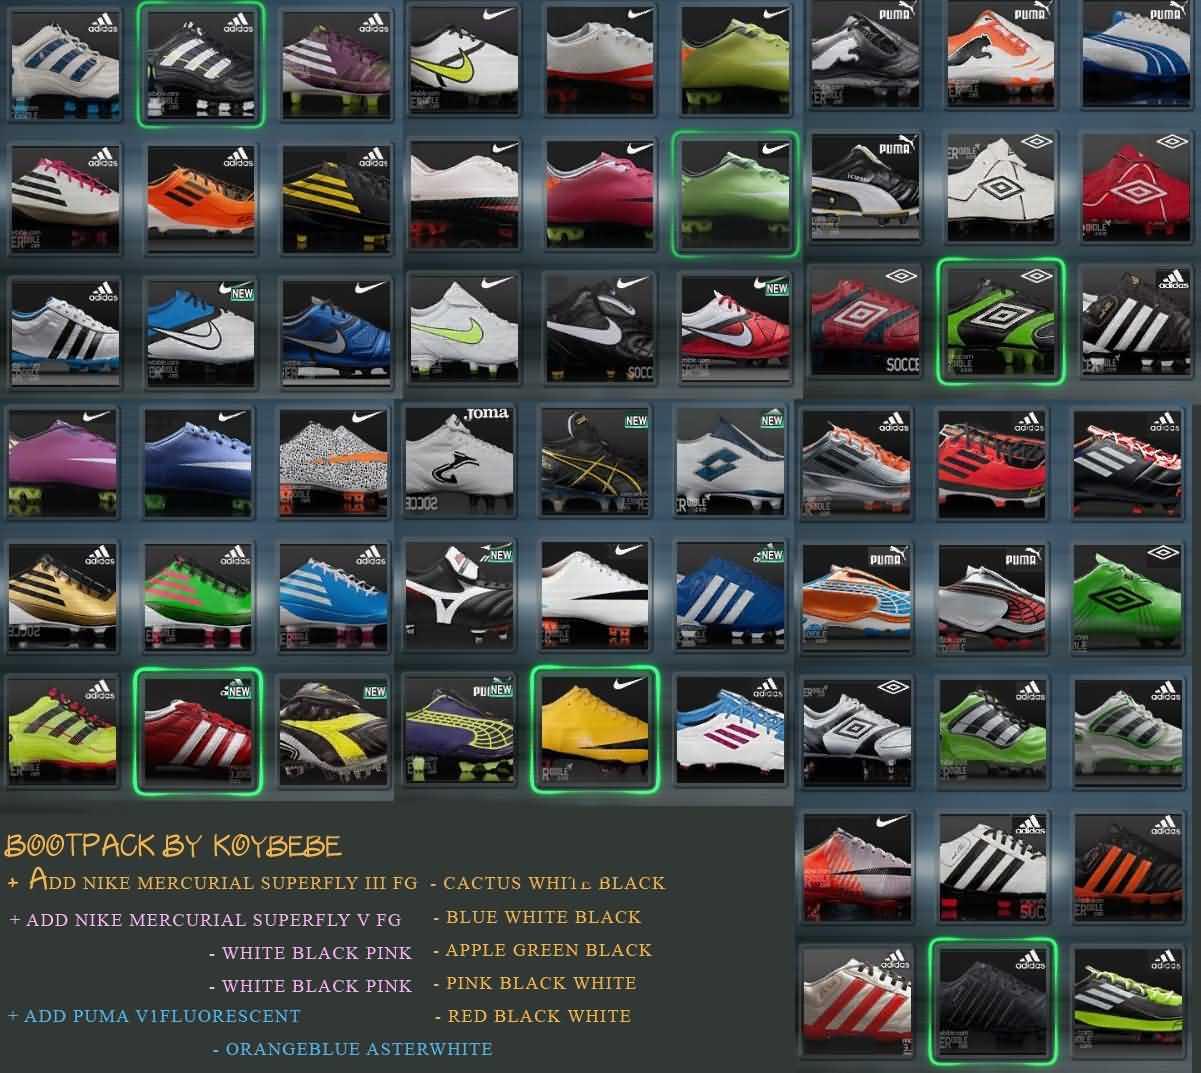 Th  M 5 Nike Mercurial Vapor Superfly III FG   2 Nike Mercurial Vapor